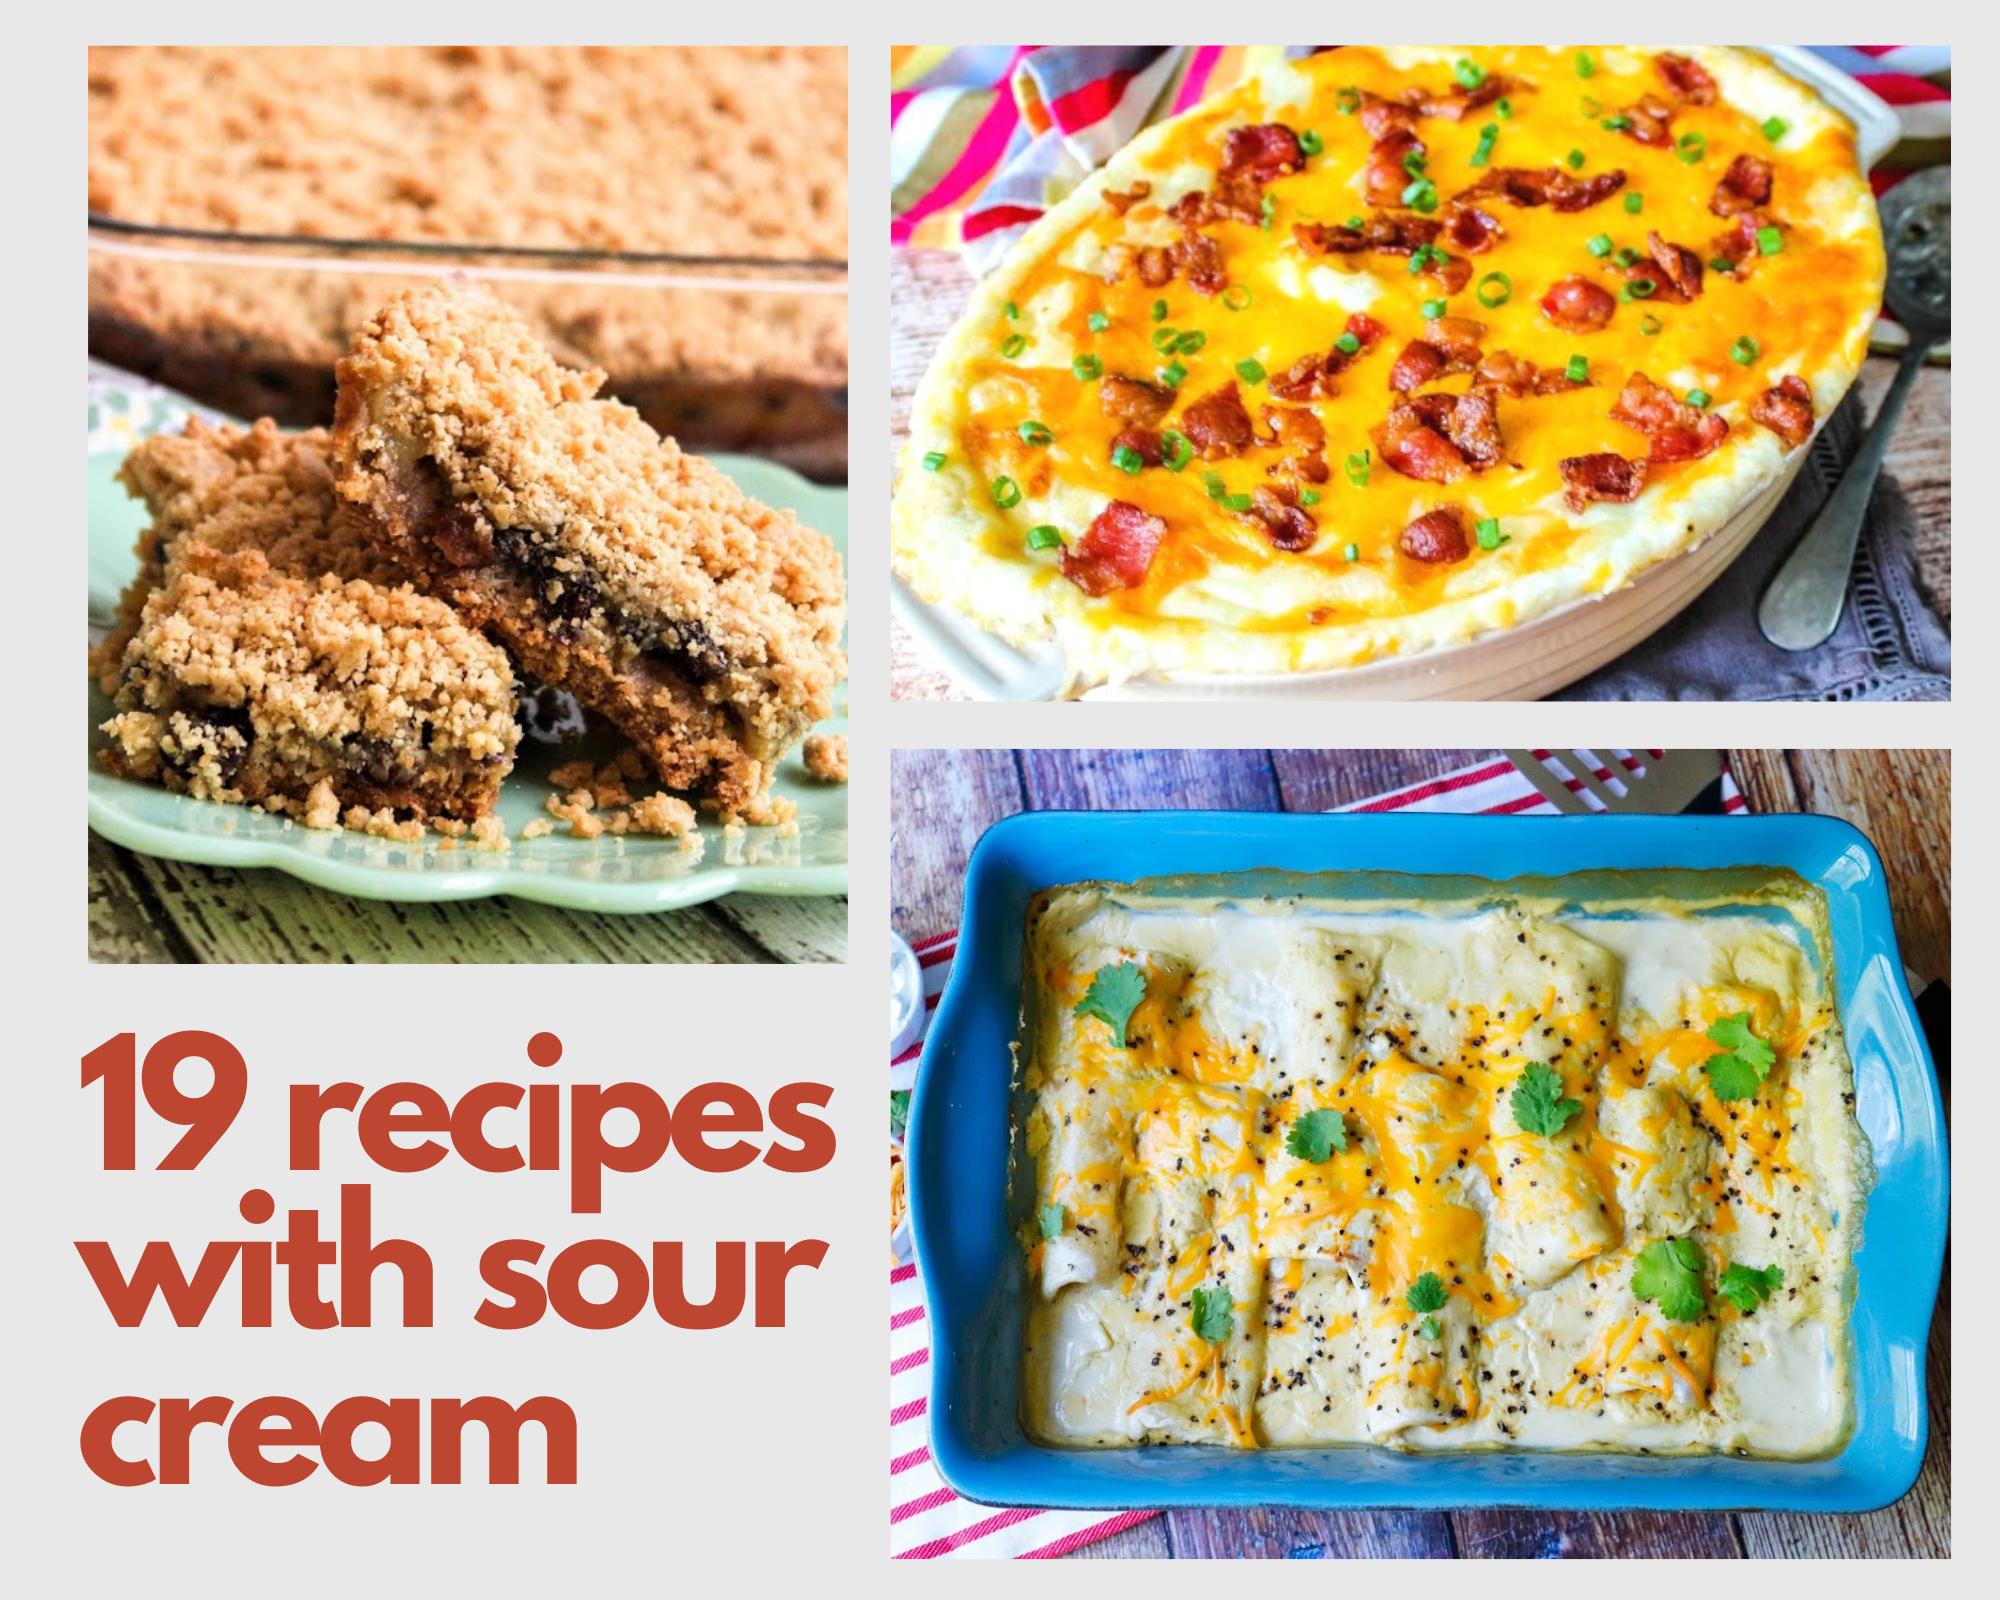 recipes with sour cream